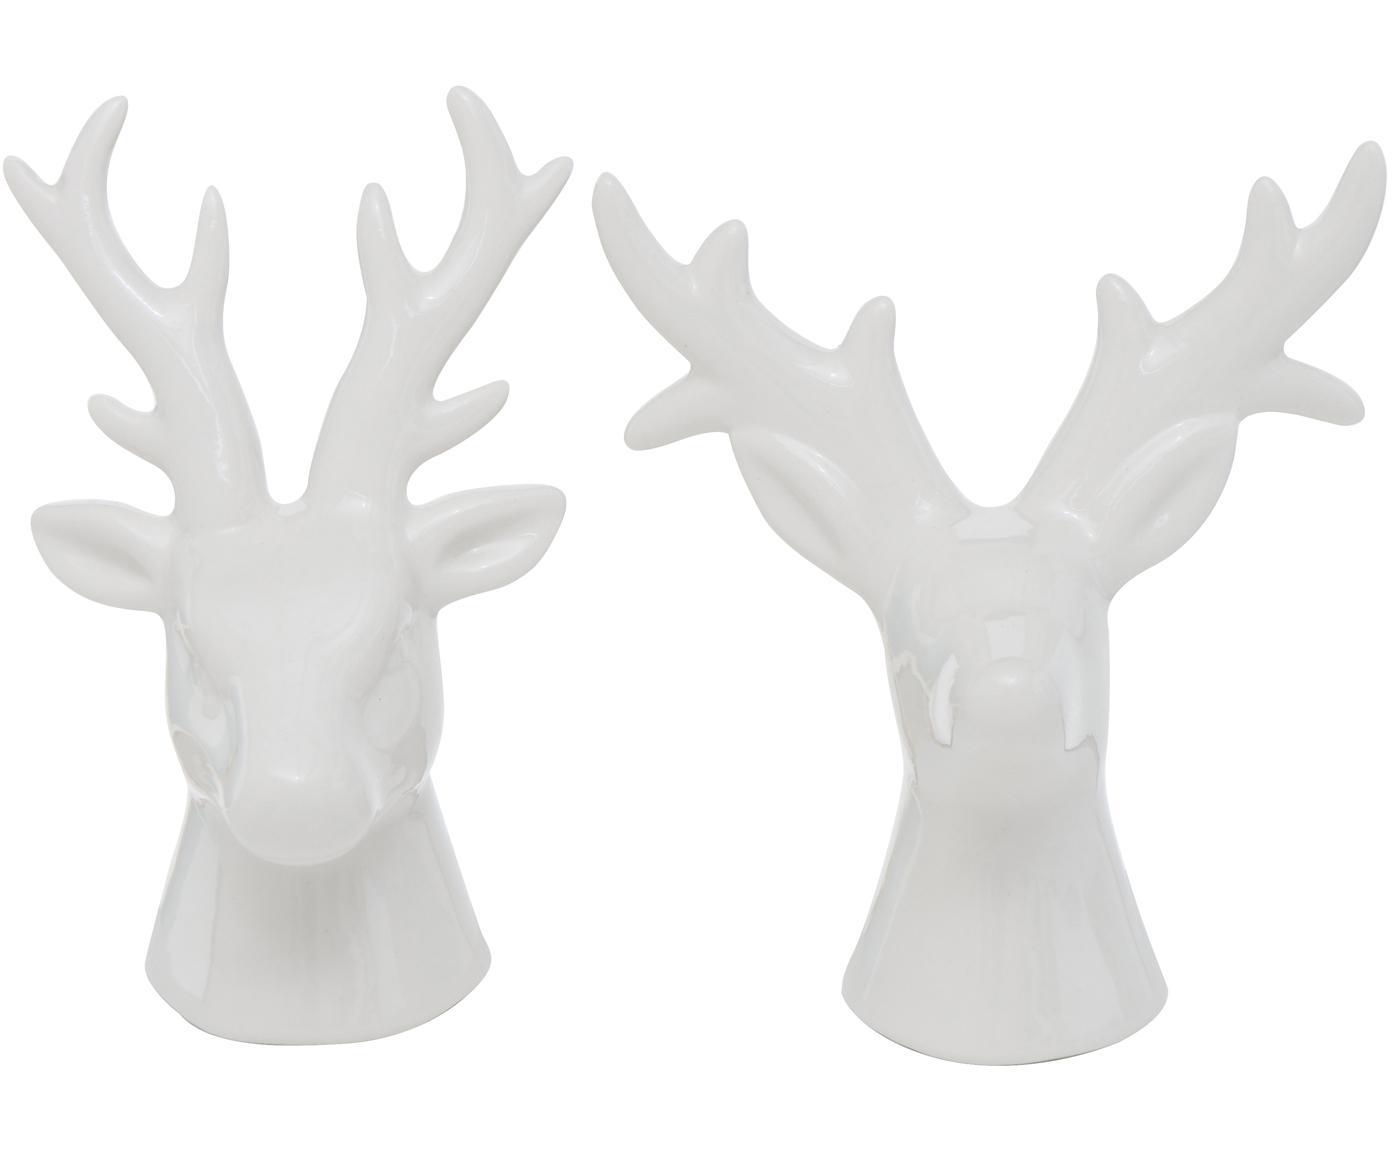 Set 2 oggetti decorativi Thore, Porcellana, Bianco, Larg. 11 x Alt. 12 cm